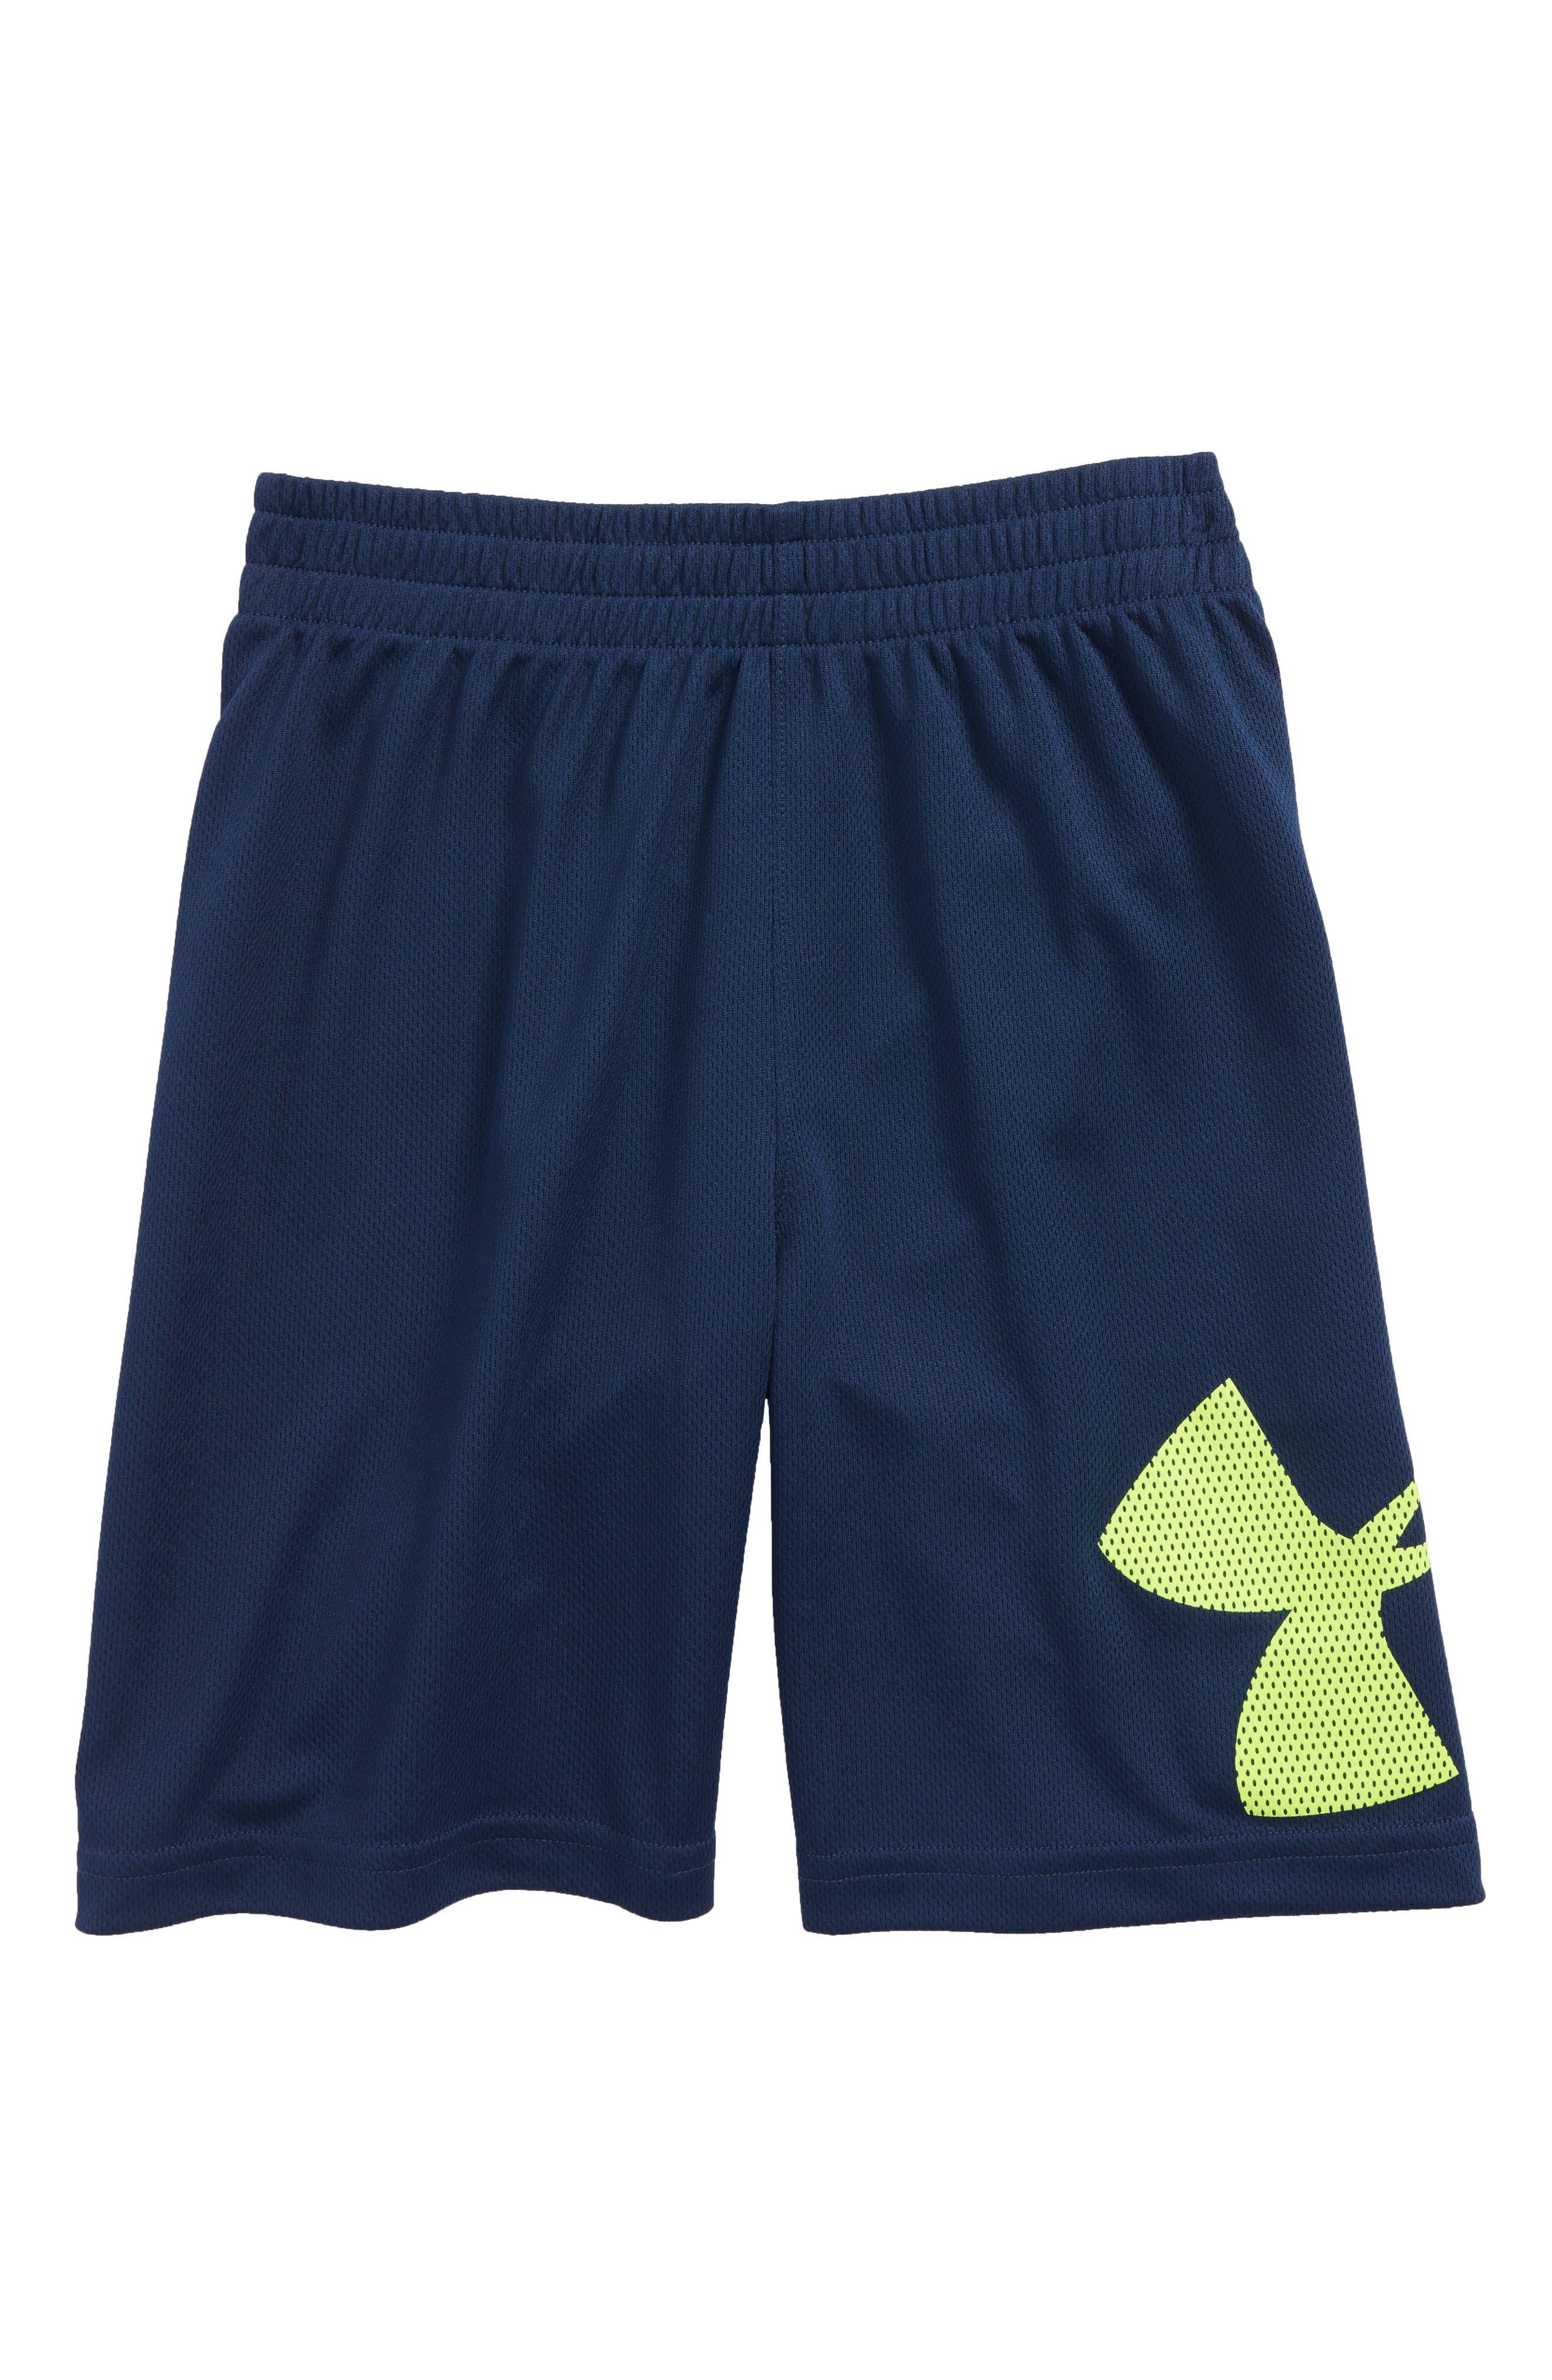 Under Armour Zoom Striker Mesh HeatGear® Shorts (Toddler Boys & Little Boys)